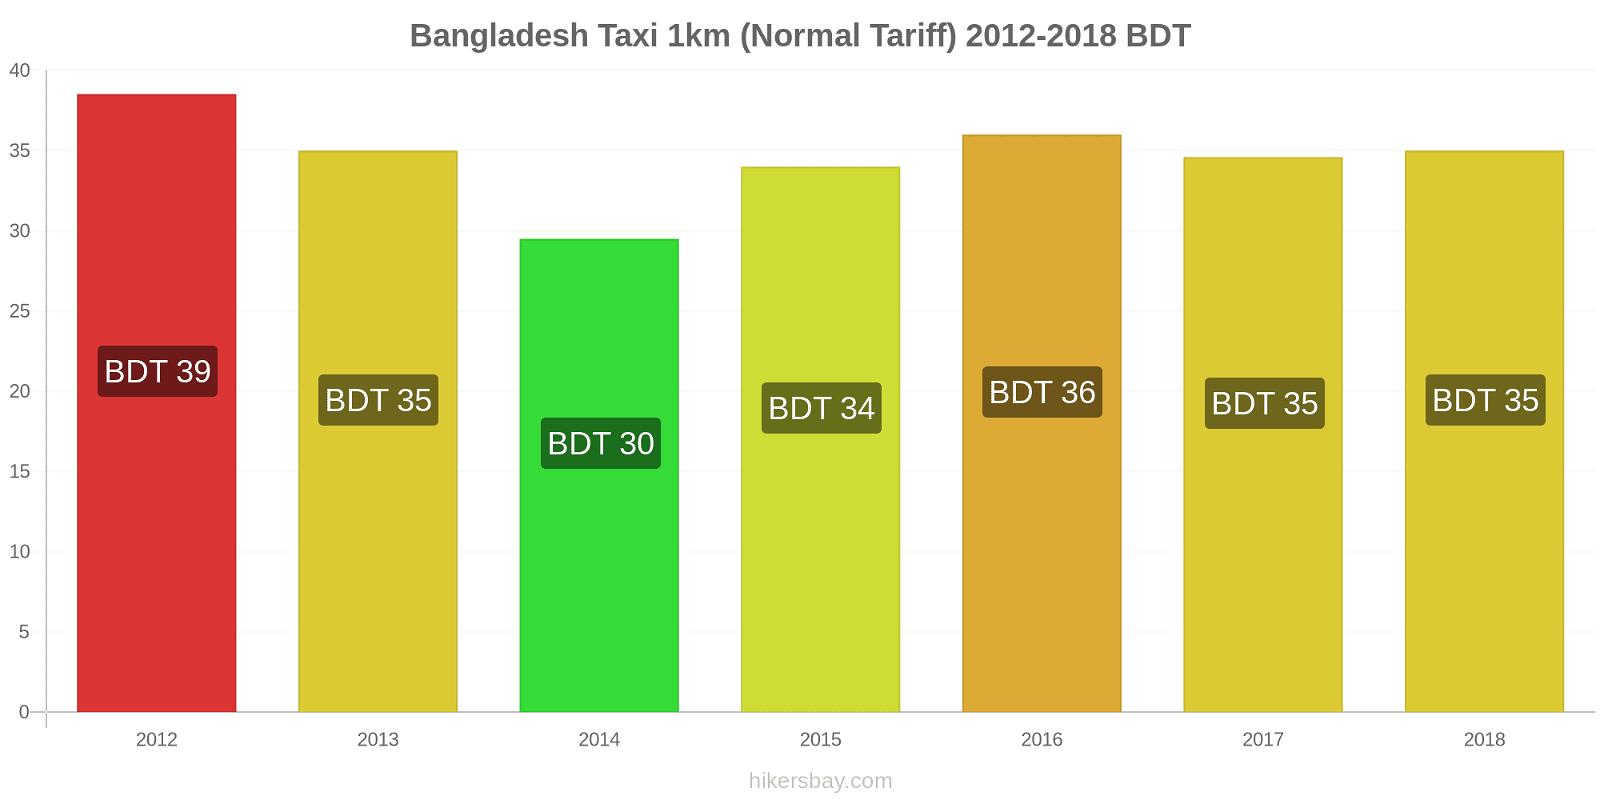 Bangladesh price changes Taxi 1km (Normal Tariff) hikersbay.com